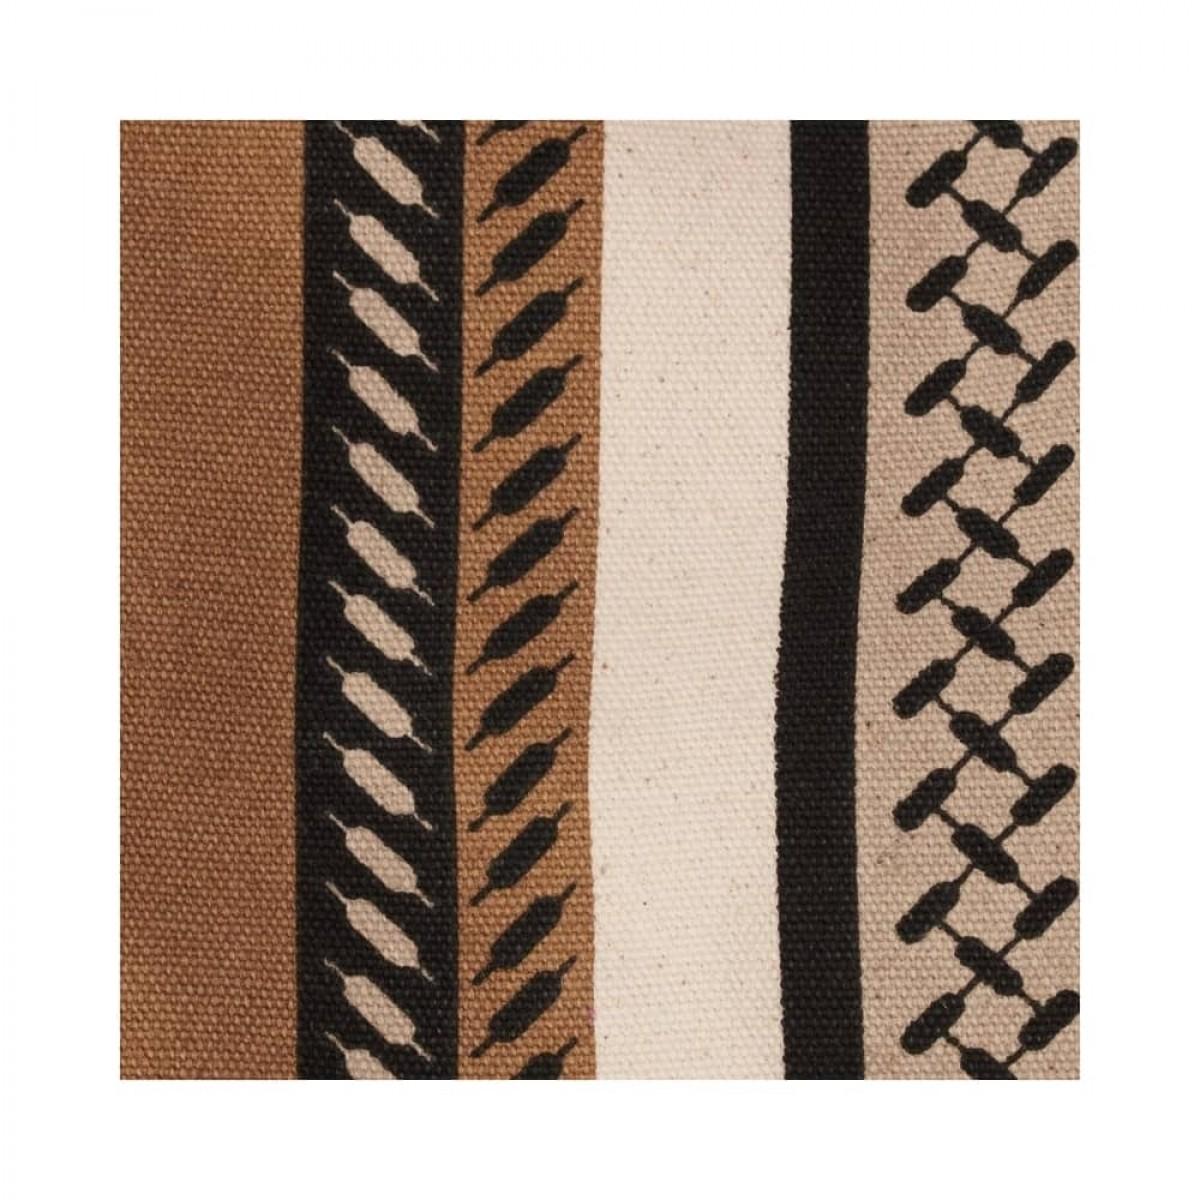 big tote josie bag - kufiya hessian dune - print